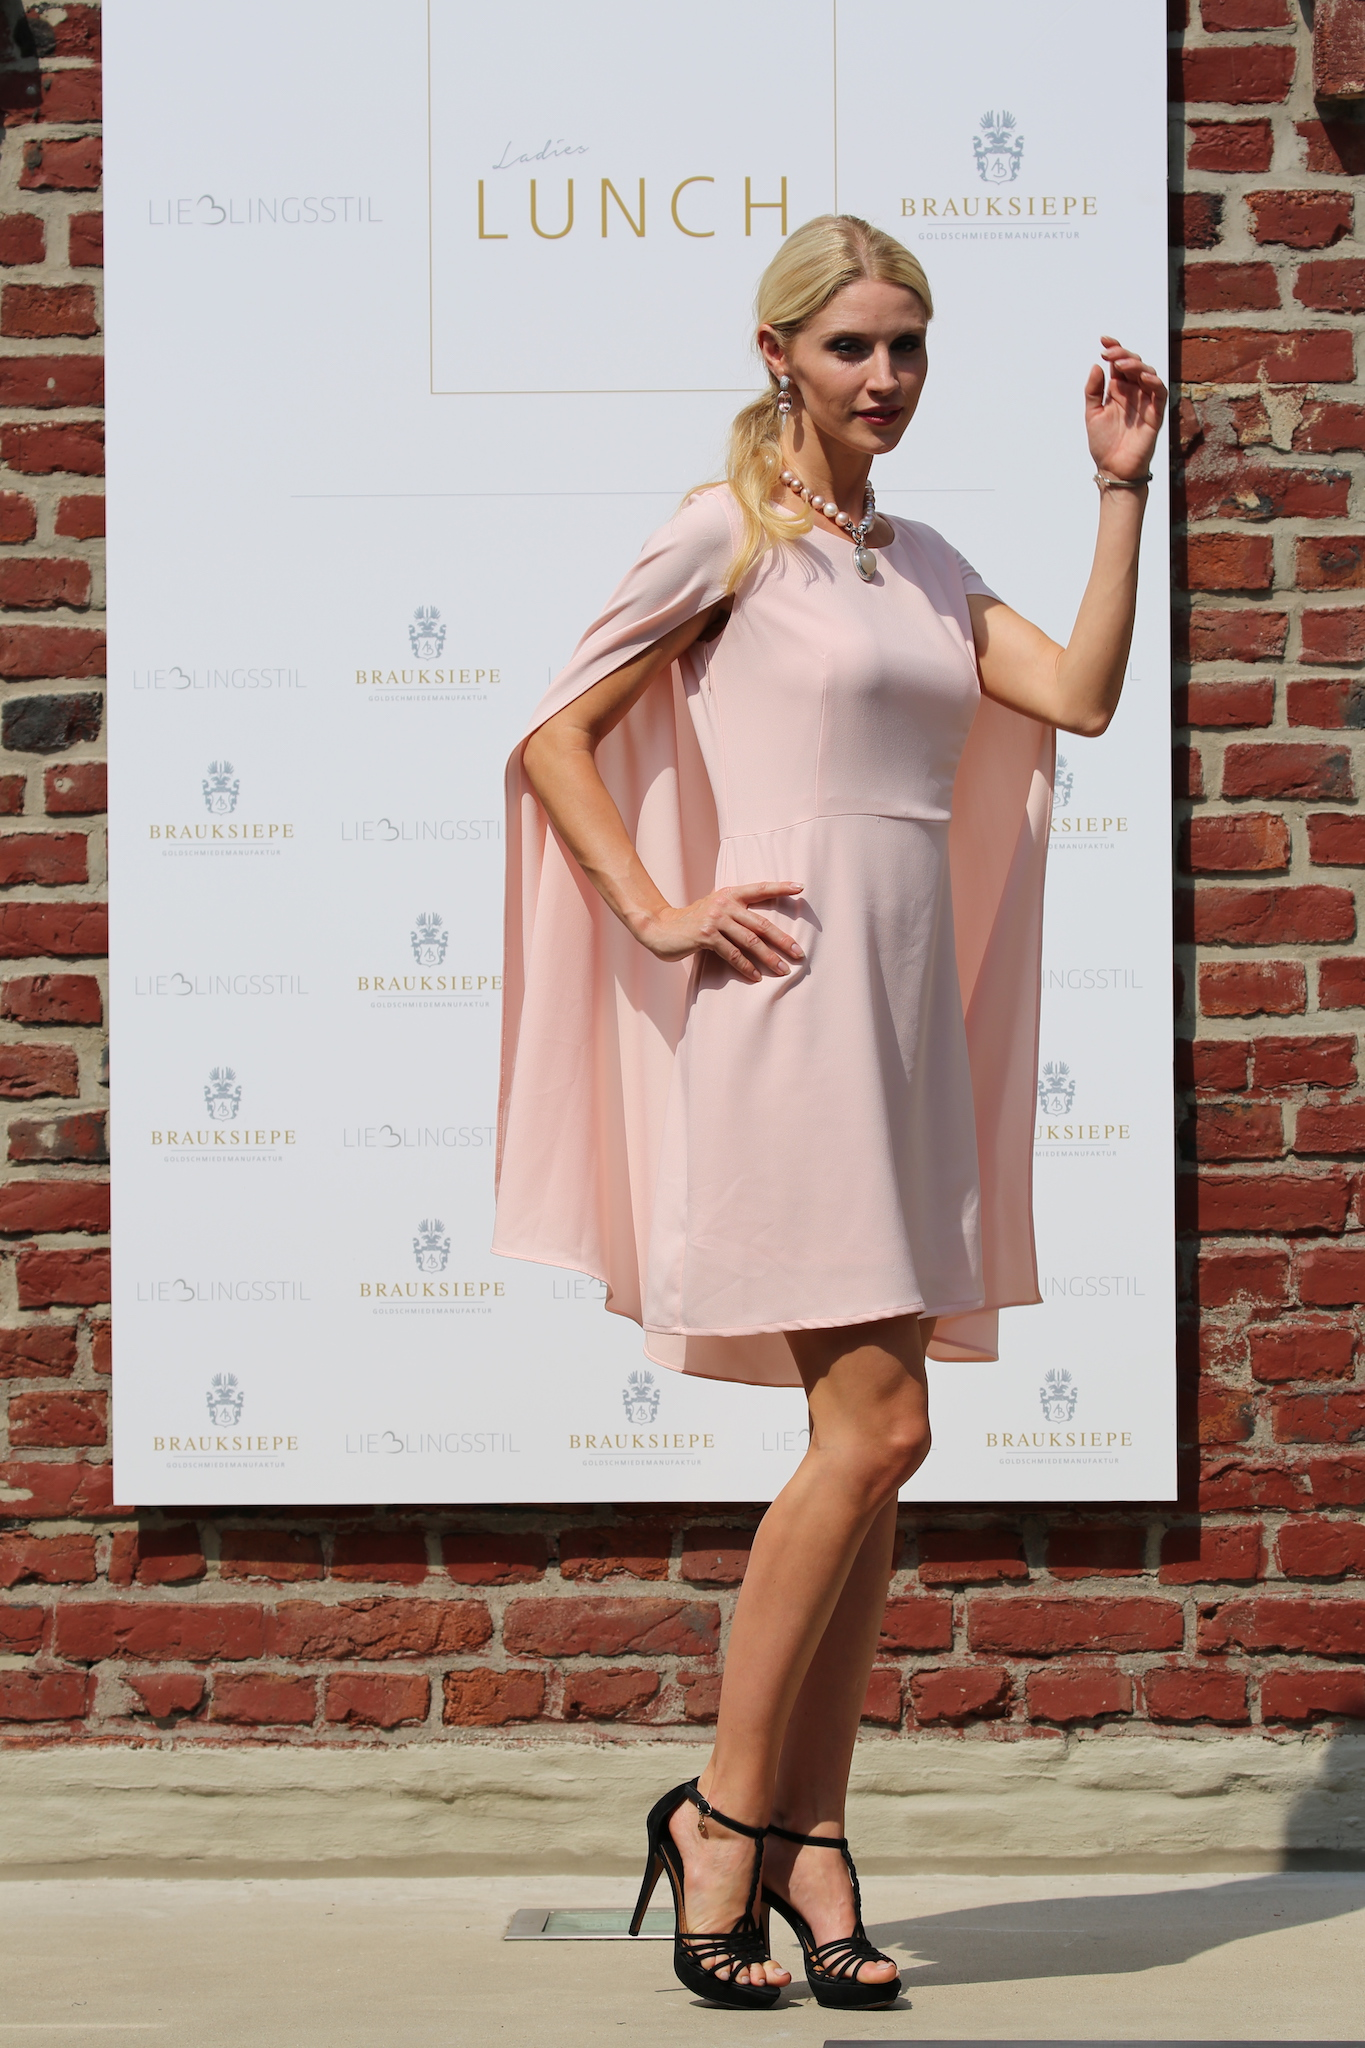 Stefanie Seiffert Model, Cuplé Kleid, Cuplé Mode, Cuplé Moda, Cuplé Fashion. Fashion-Blog, Lieblingsstil.com,